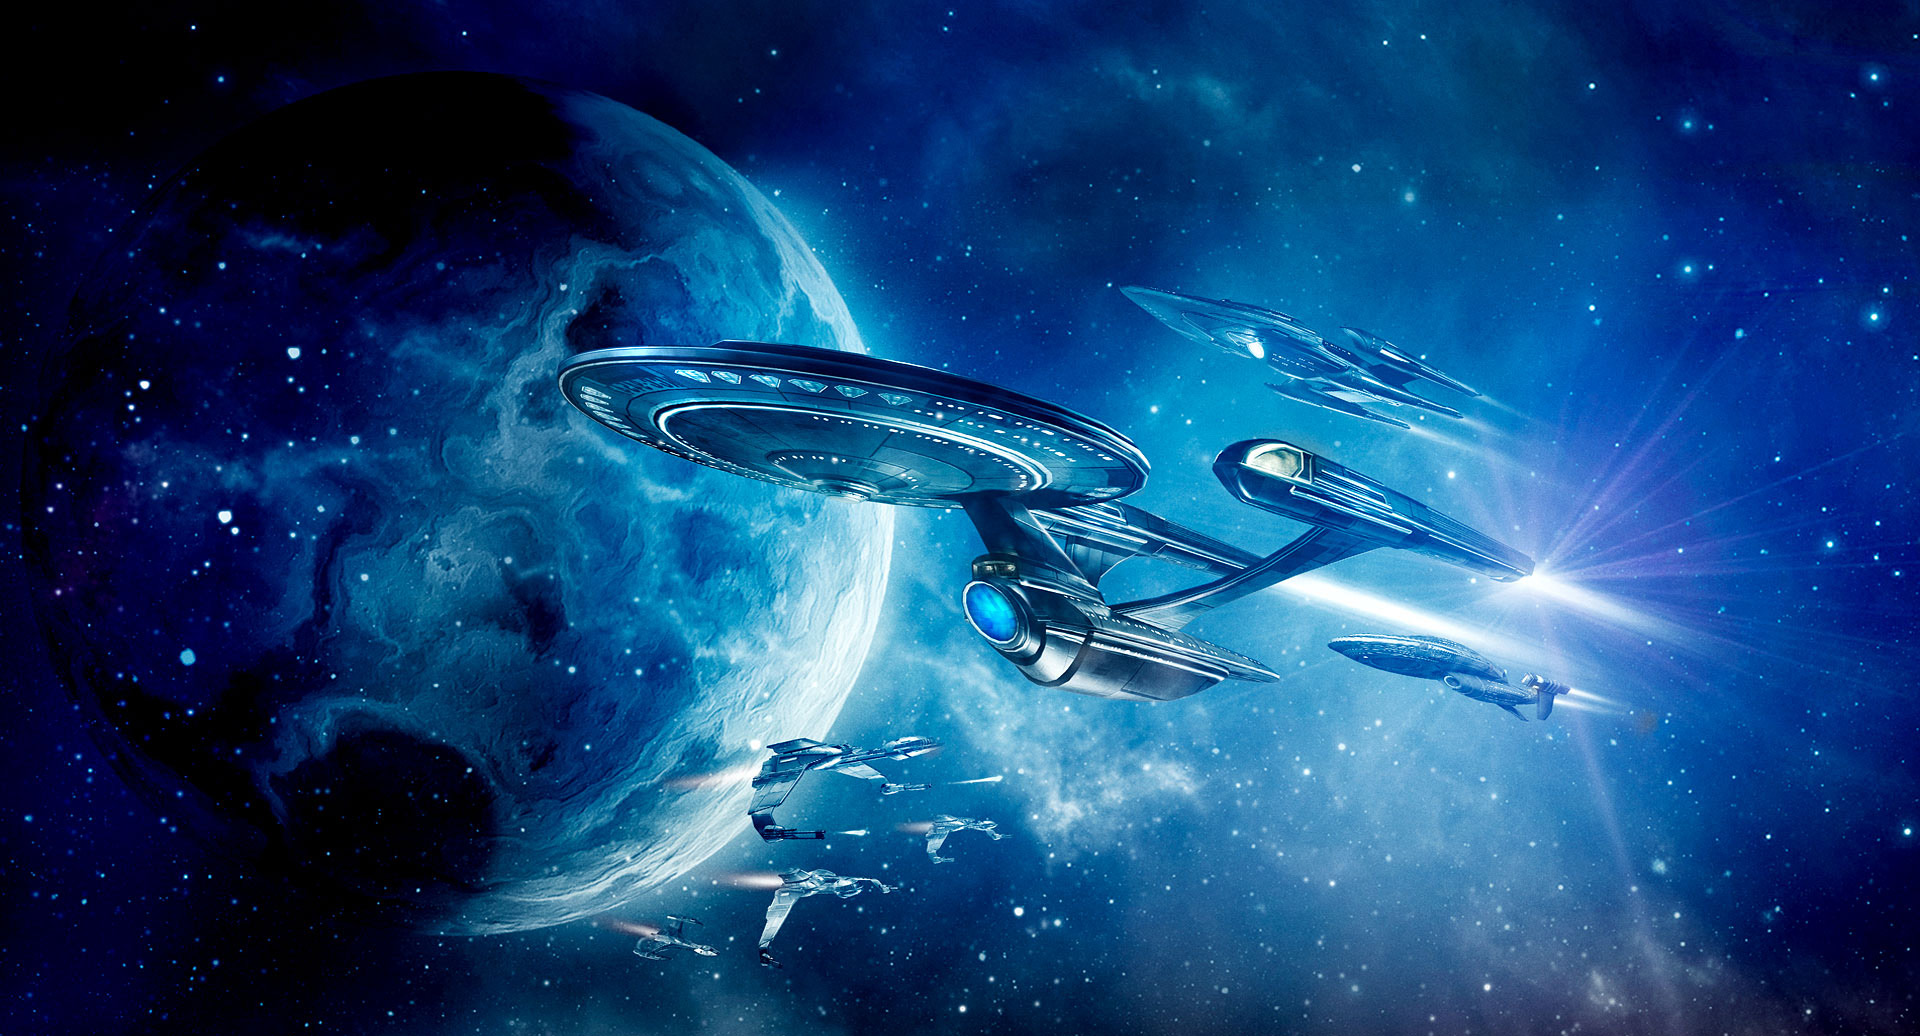 75+ Star Trek Wallpaper Hd on WallpaperSafari